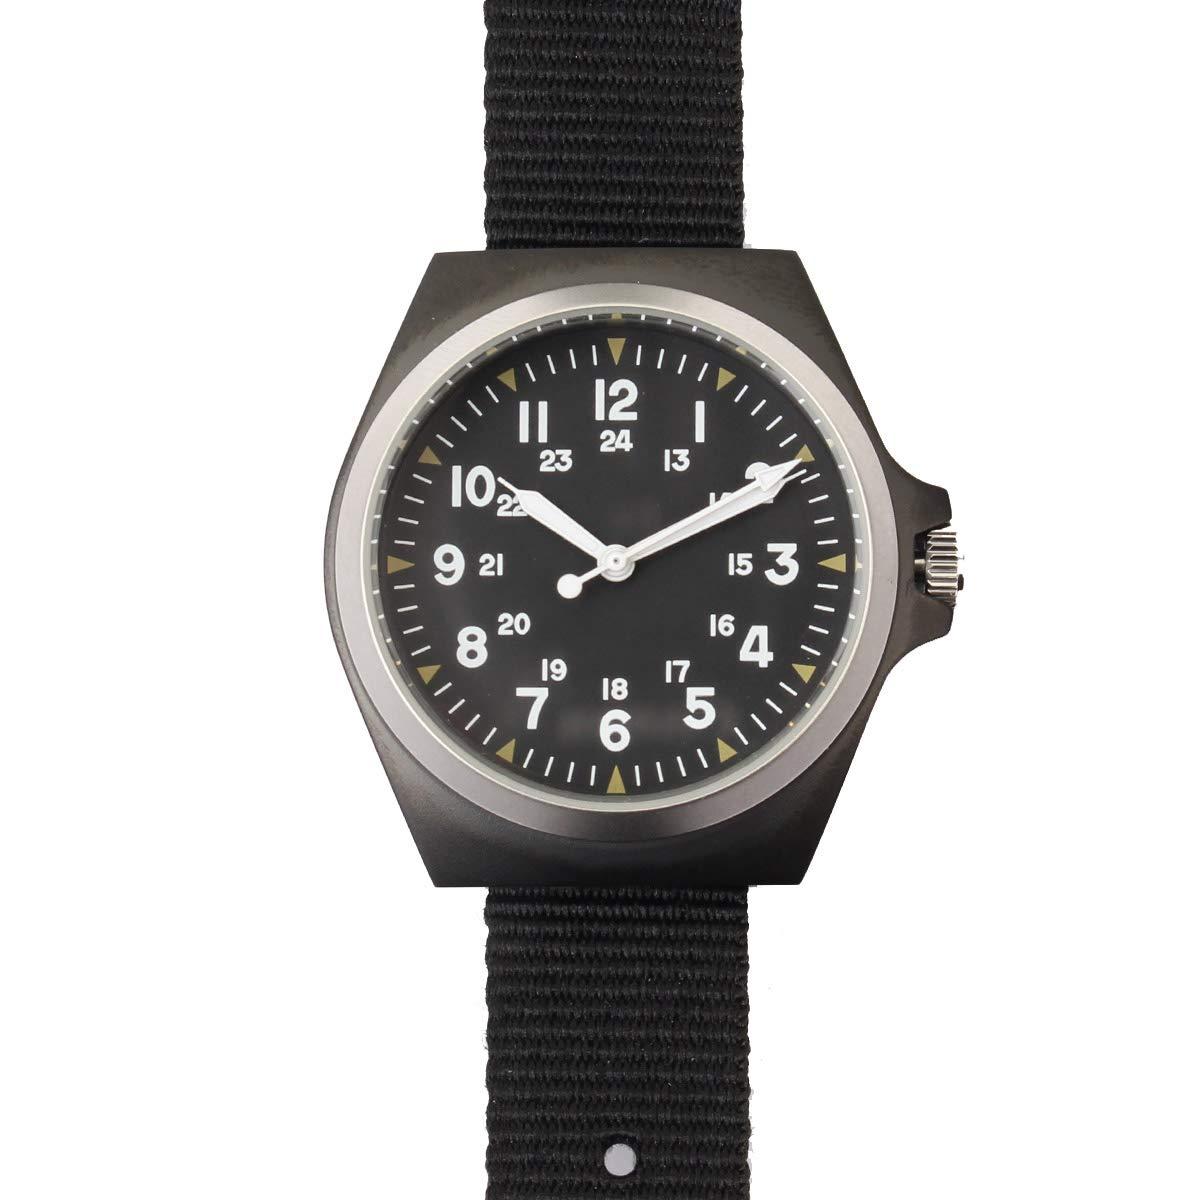 Mil-Tec Army Uhr US-Style S/Steel IP schwarz